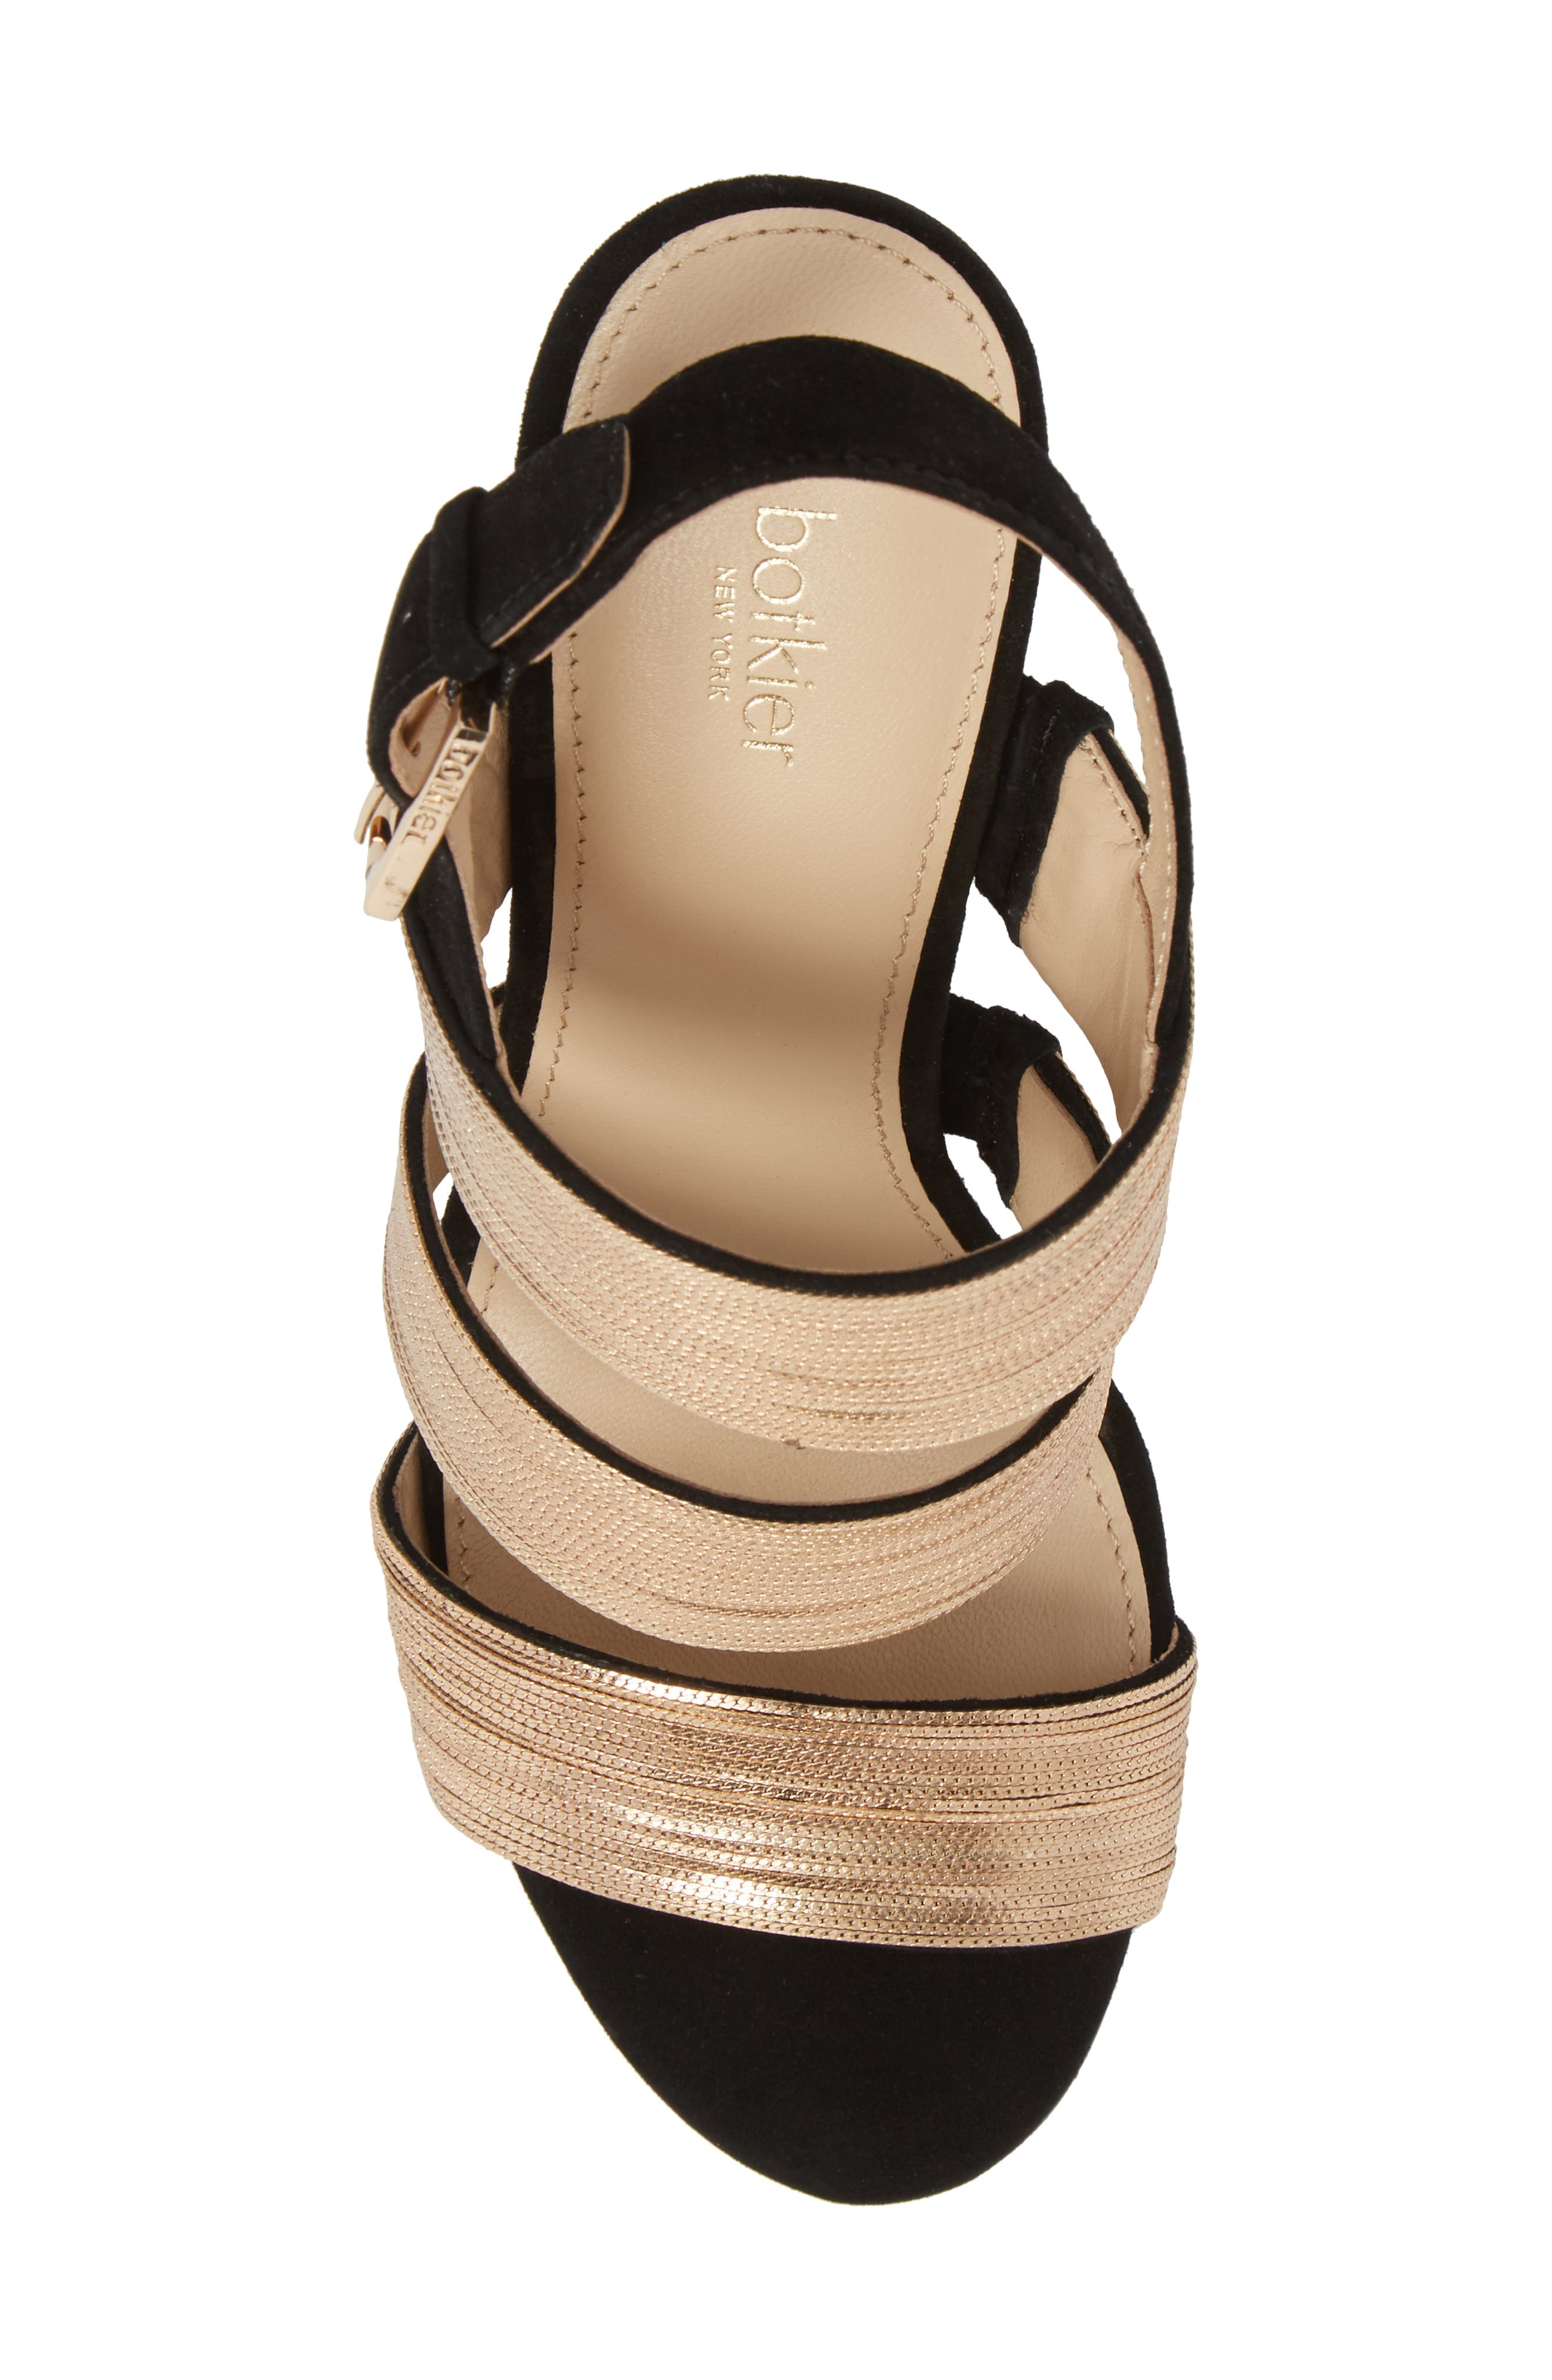 Genesa Chain Slingback Sandal,                             Alternate thumbnail 5, color,                             Black/ Gold Suede